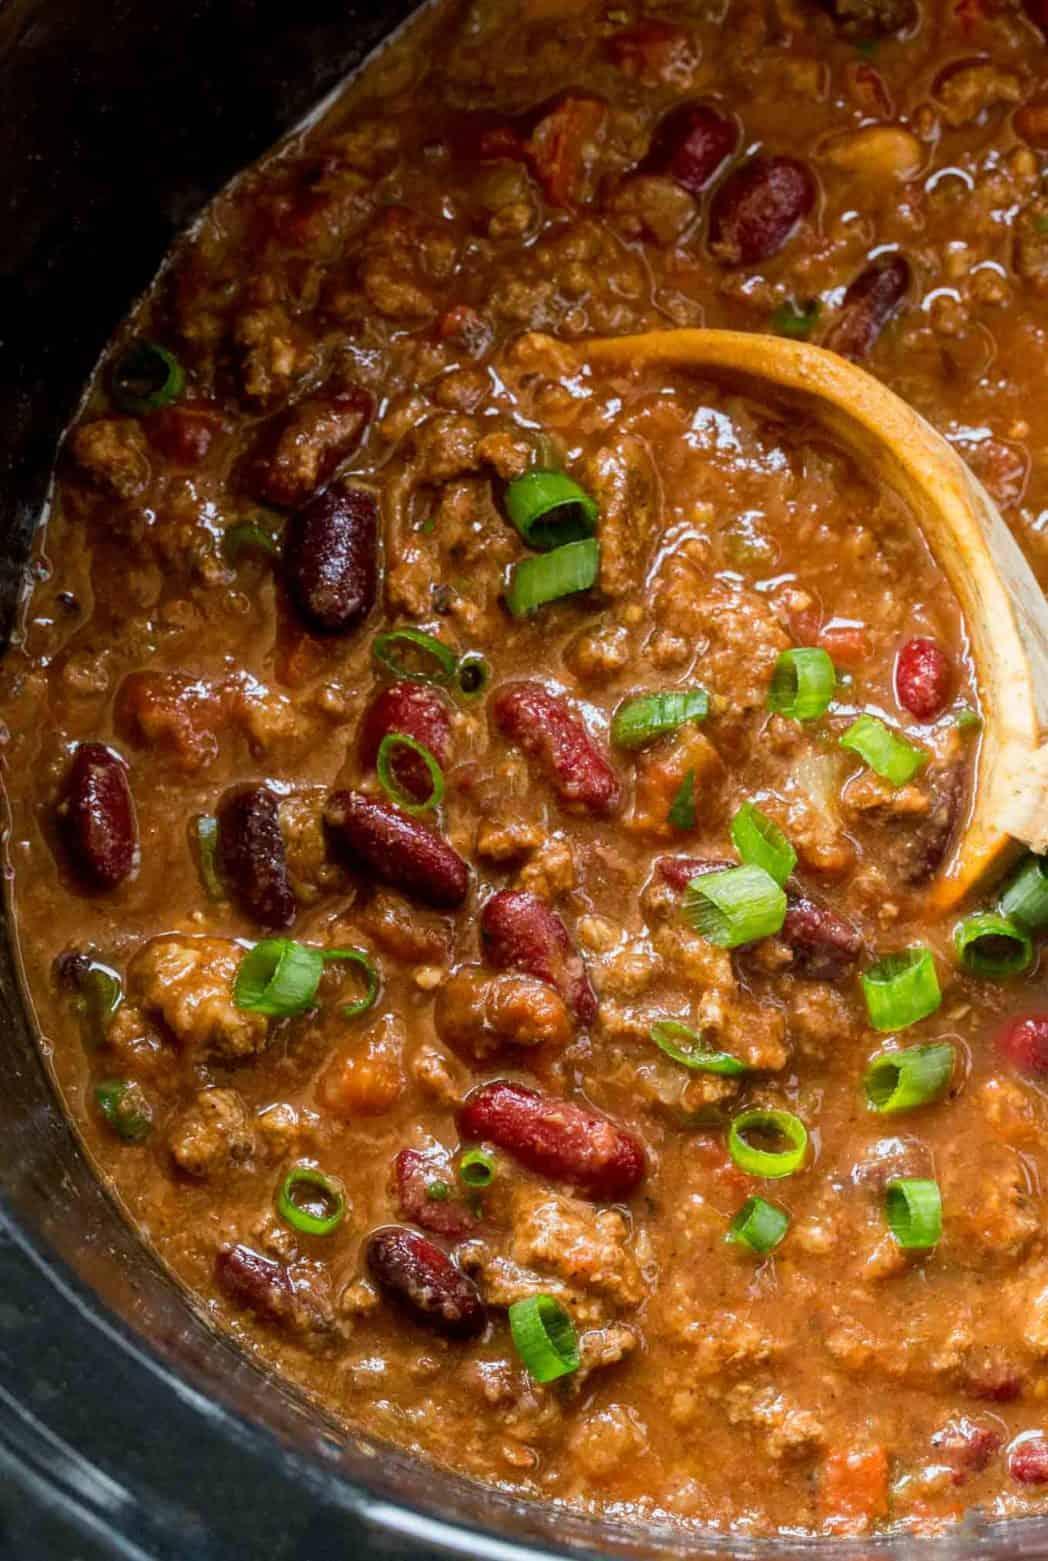 Slow Cooker Beef Chili {Crockpot Chili} - Dinner, then Dessert